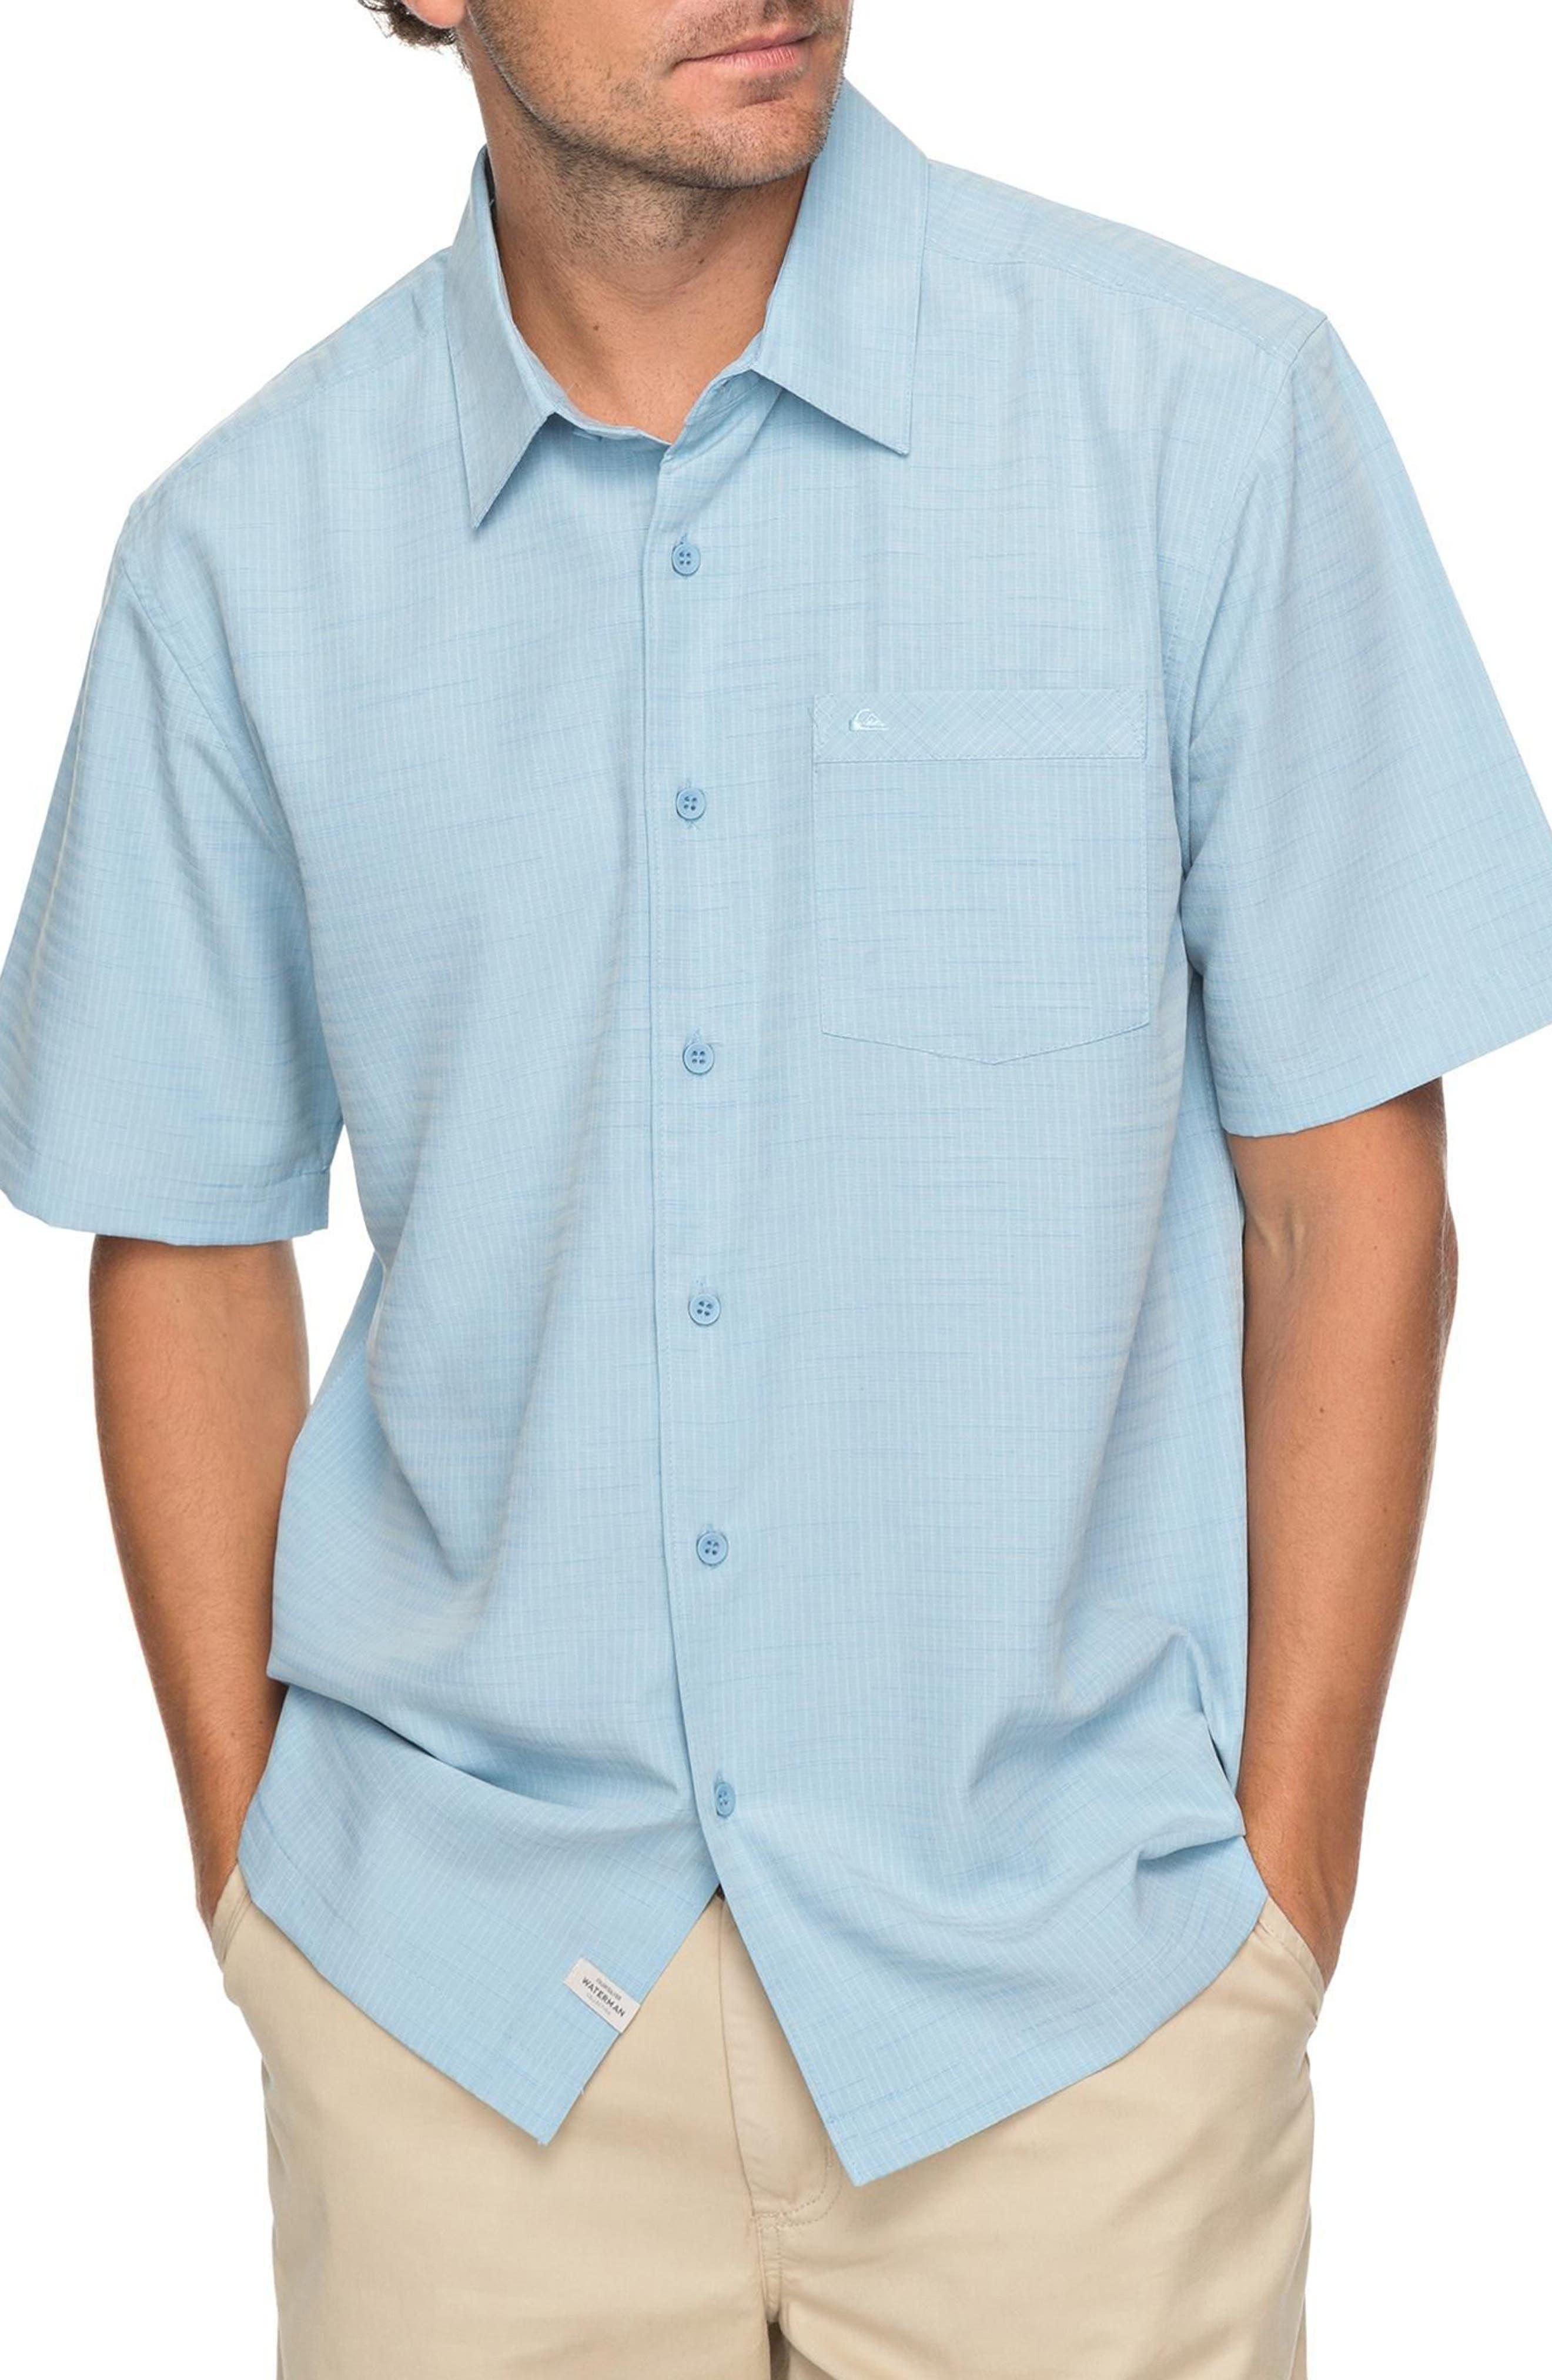 Centinala Shirt,                         Main,                         color, Blue Shadow